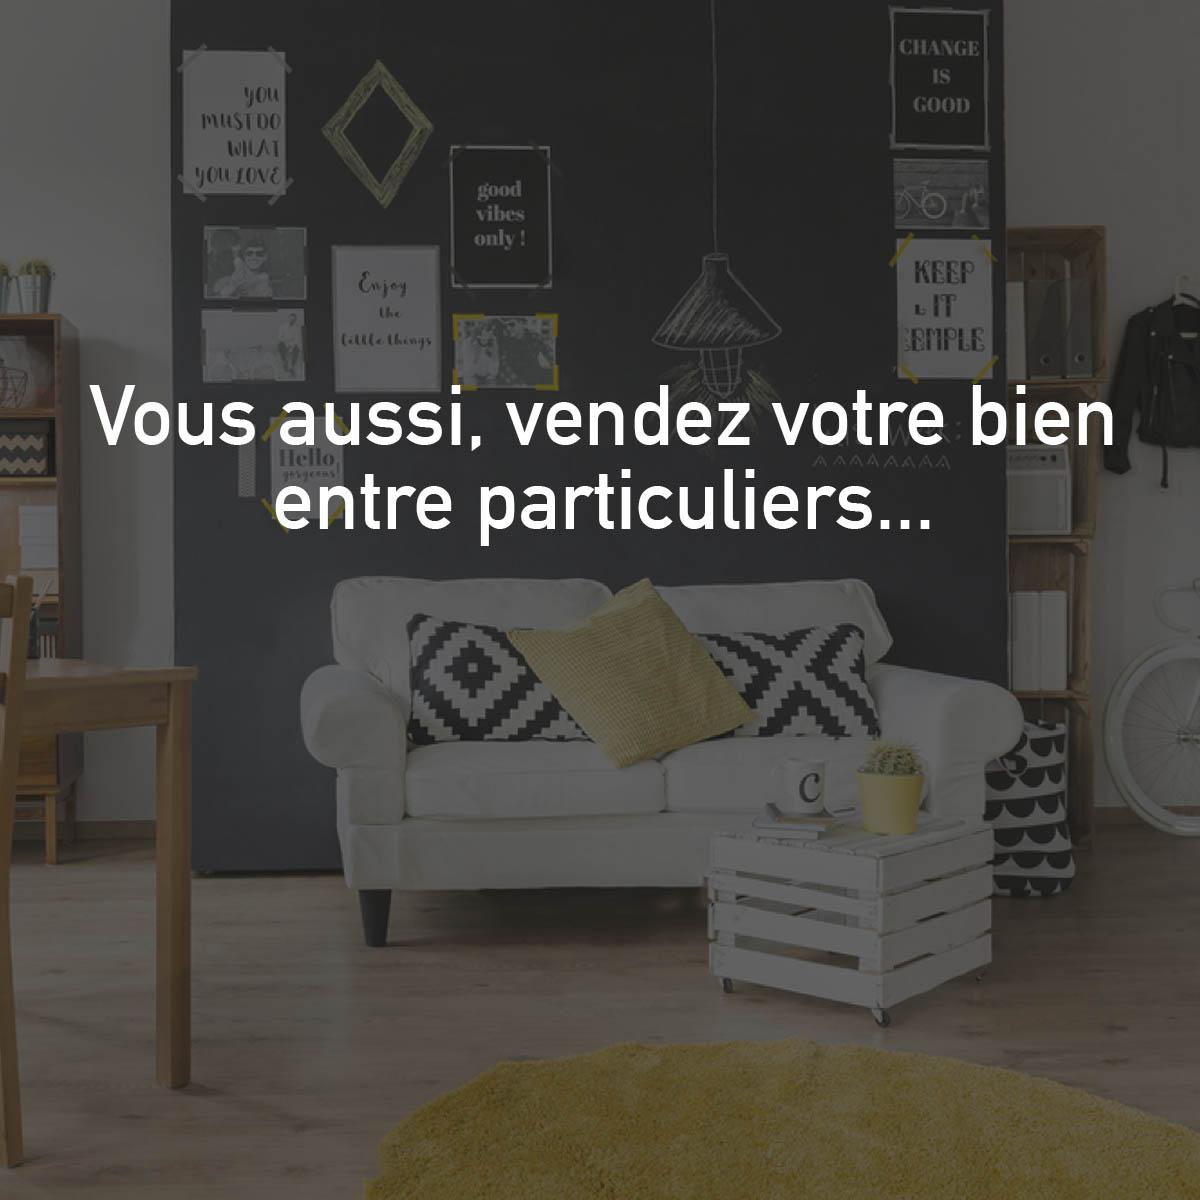 immo site d 39 annonces immobili res entre particuliers. Black Bedroom Furniture Sets. Home Design Ideas